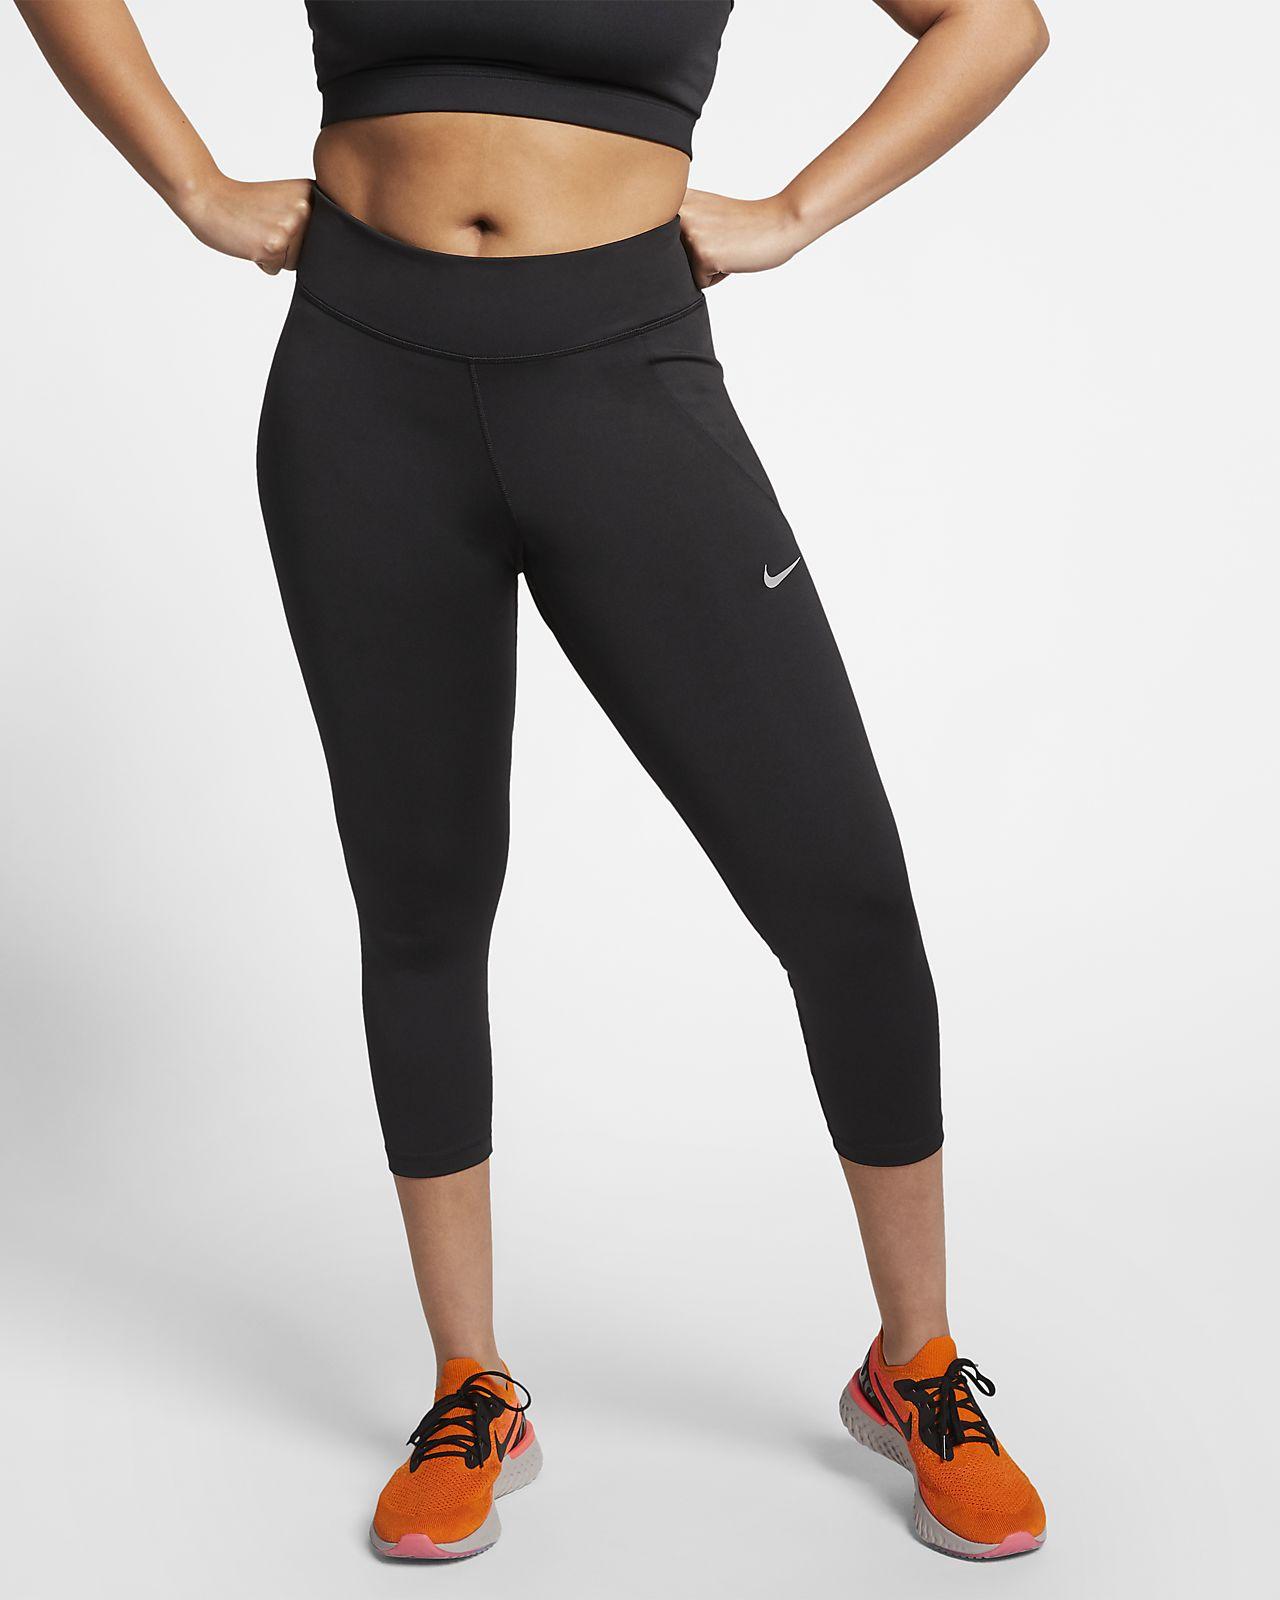 301ed6e45e3 Nike Women s 3 4 Running Crops (Plus Size). Nike.com CA